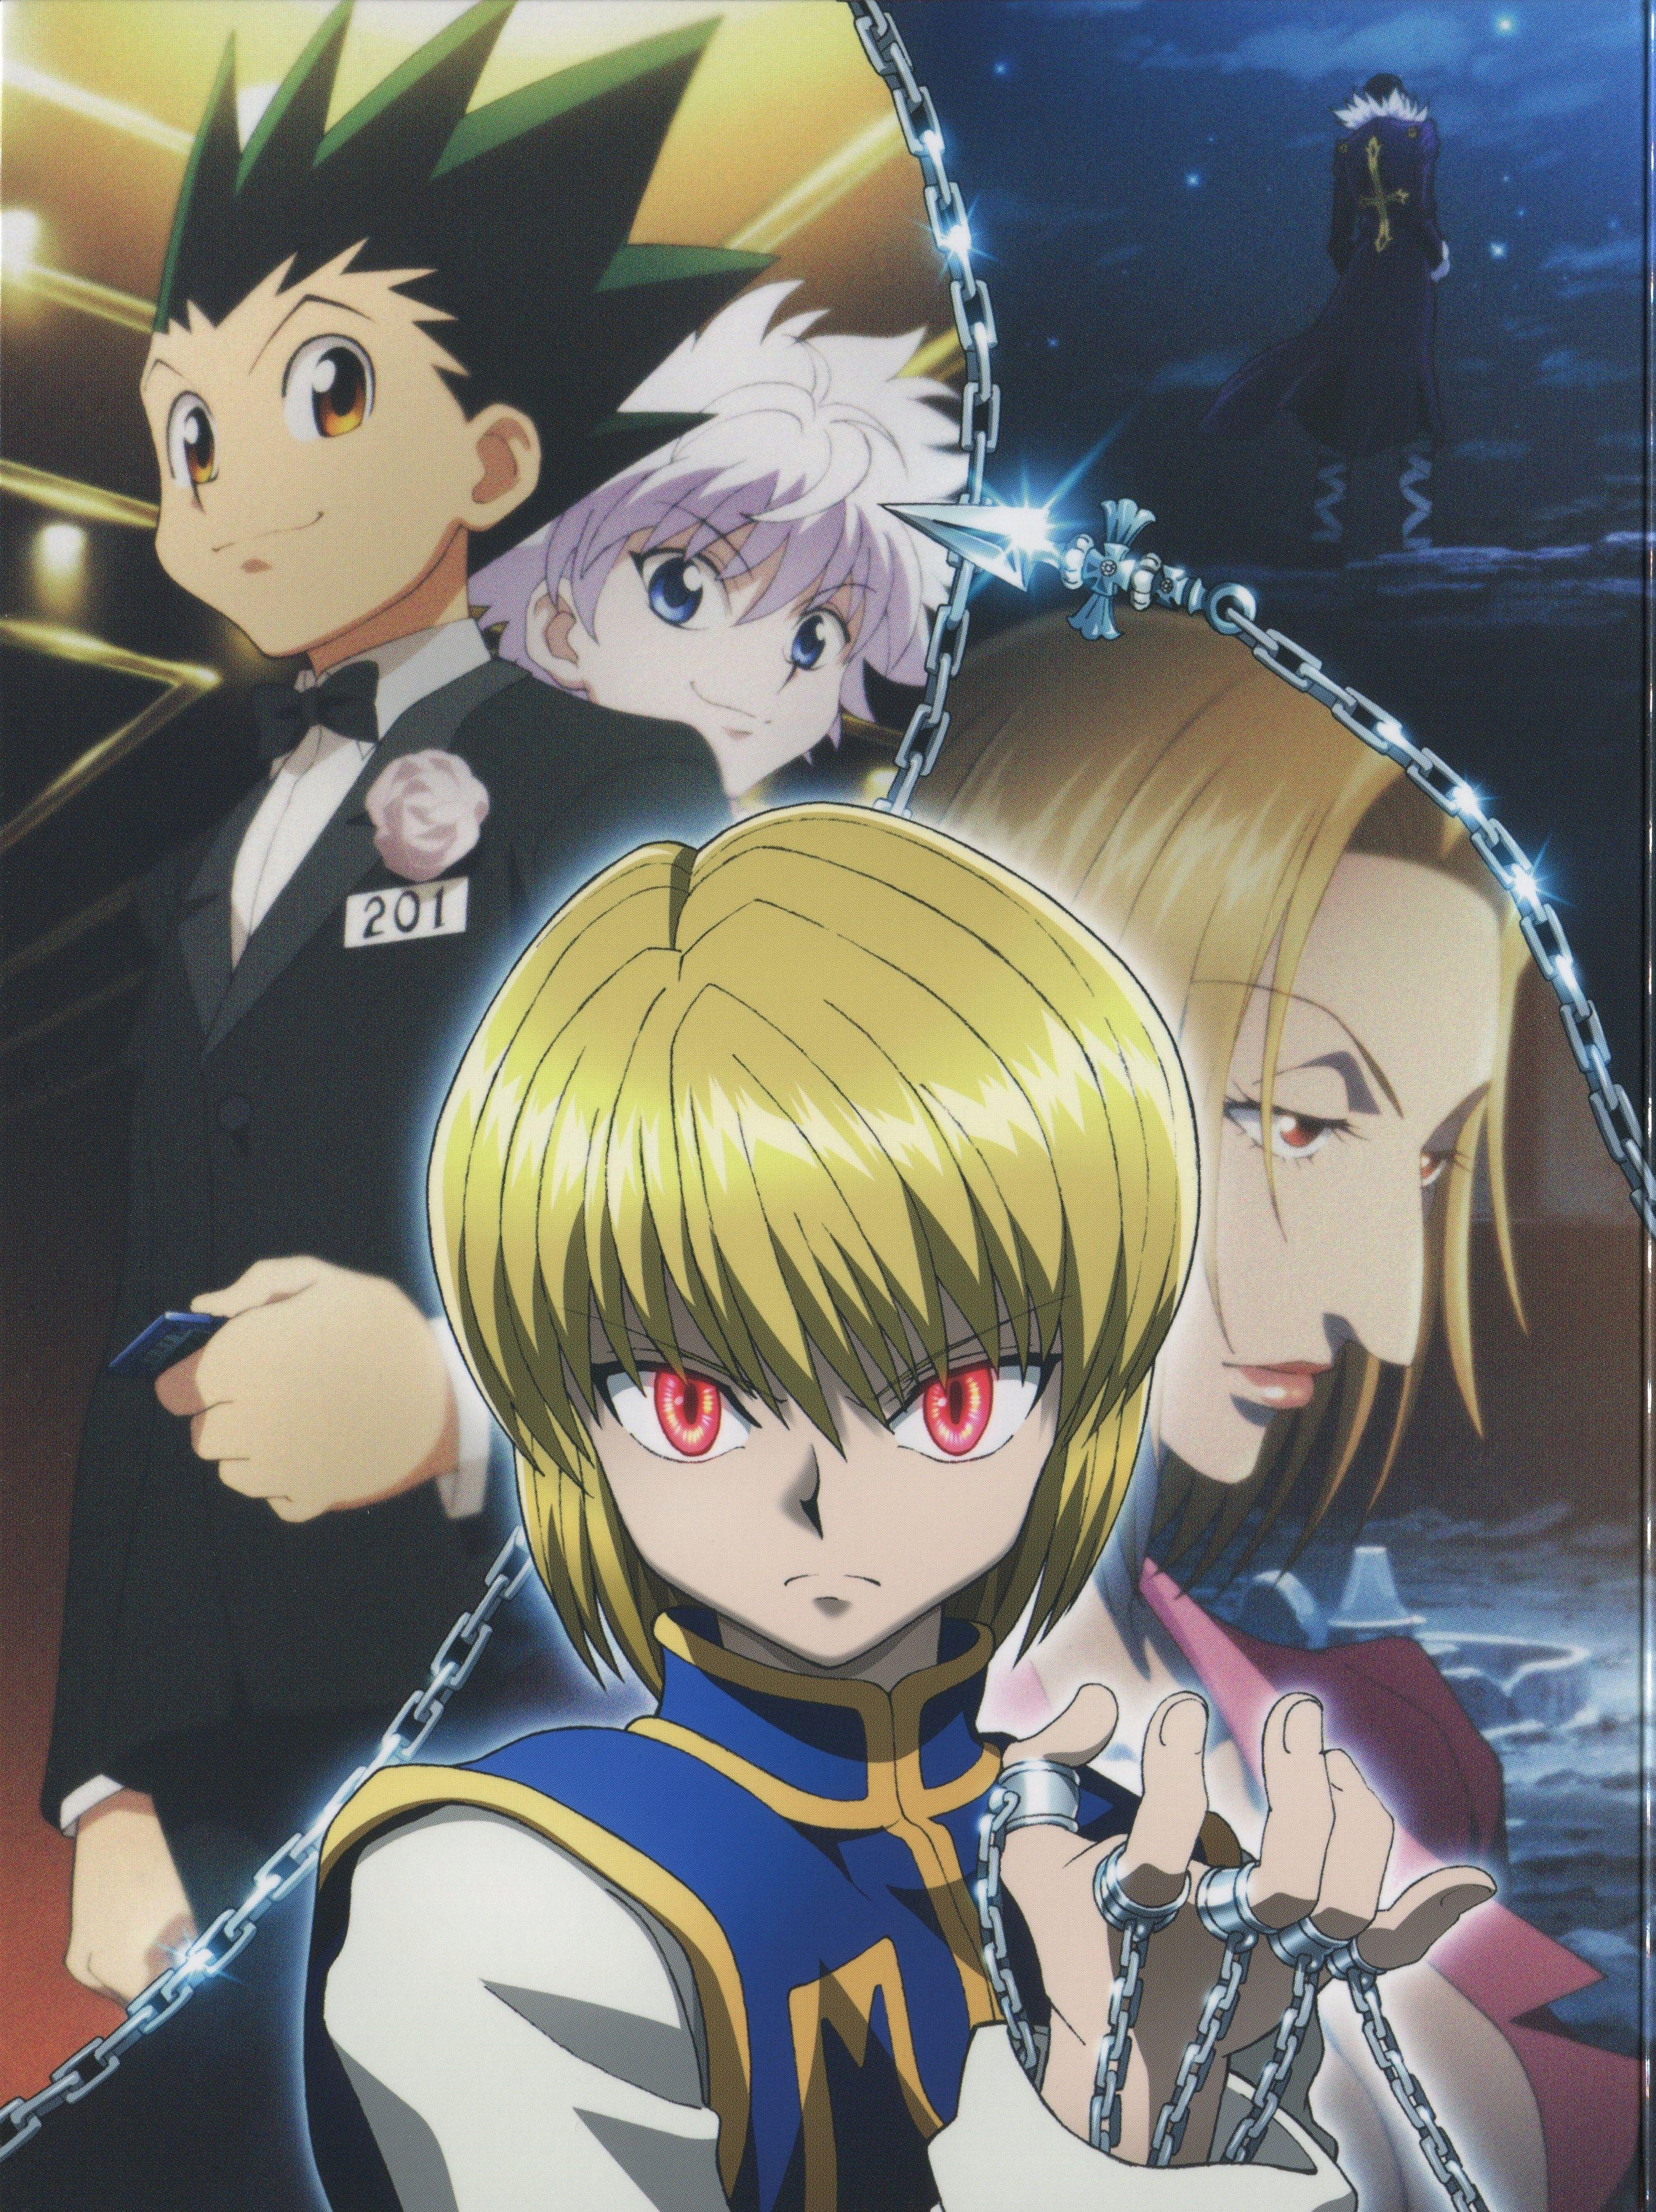 Hunter x Hunter/1840530 Hunter x hunter, Hunter anime